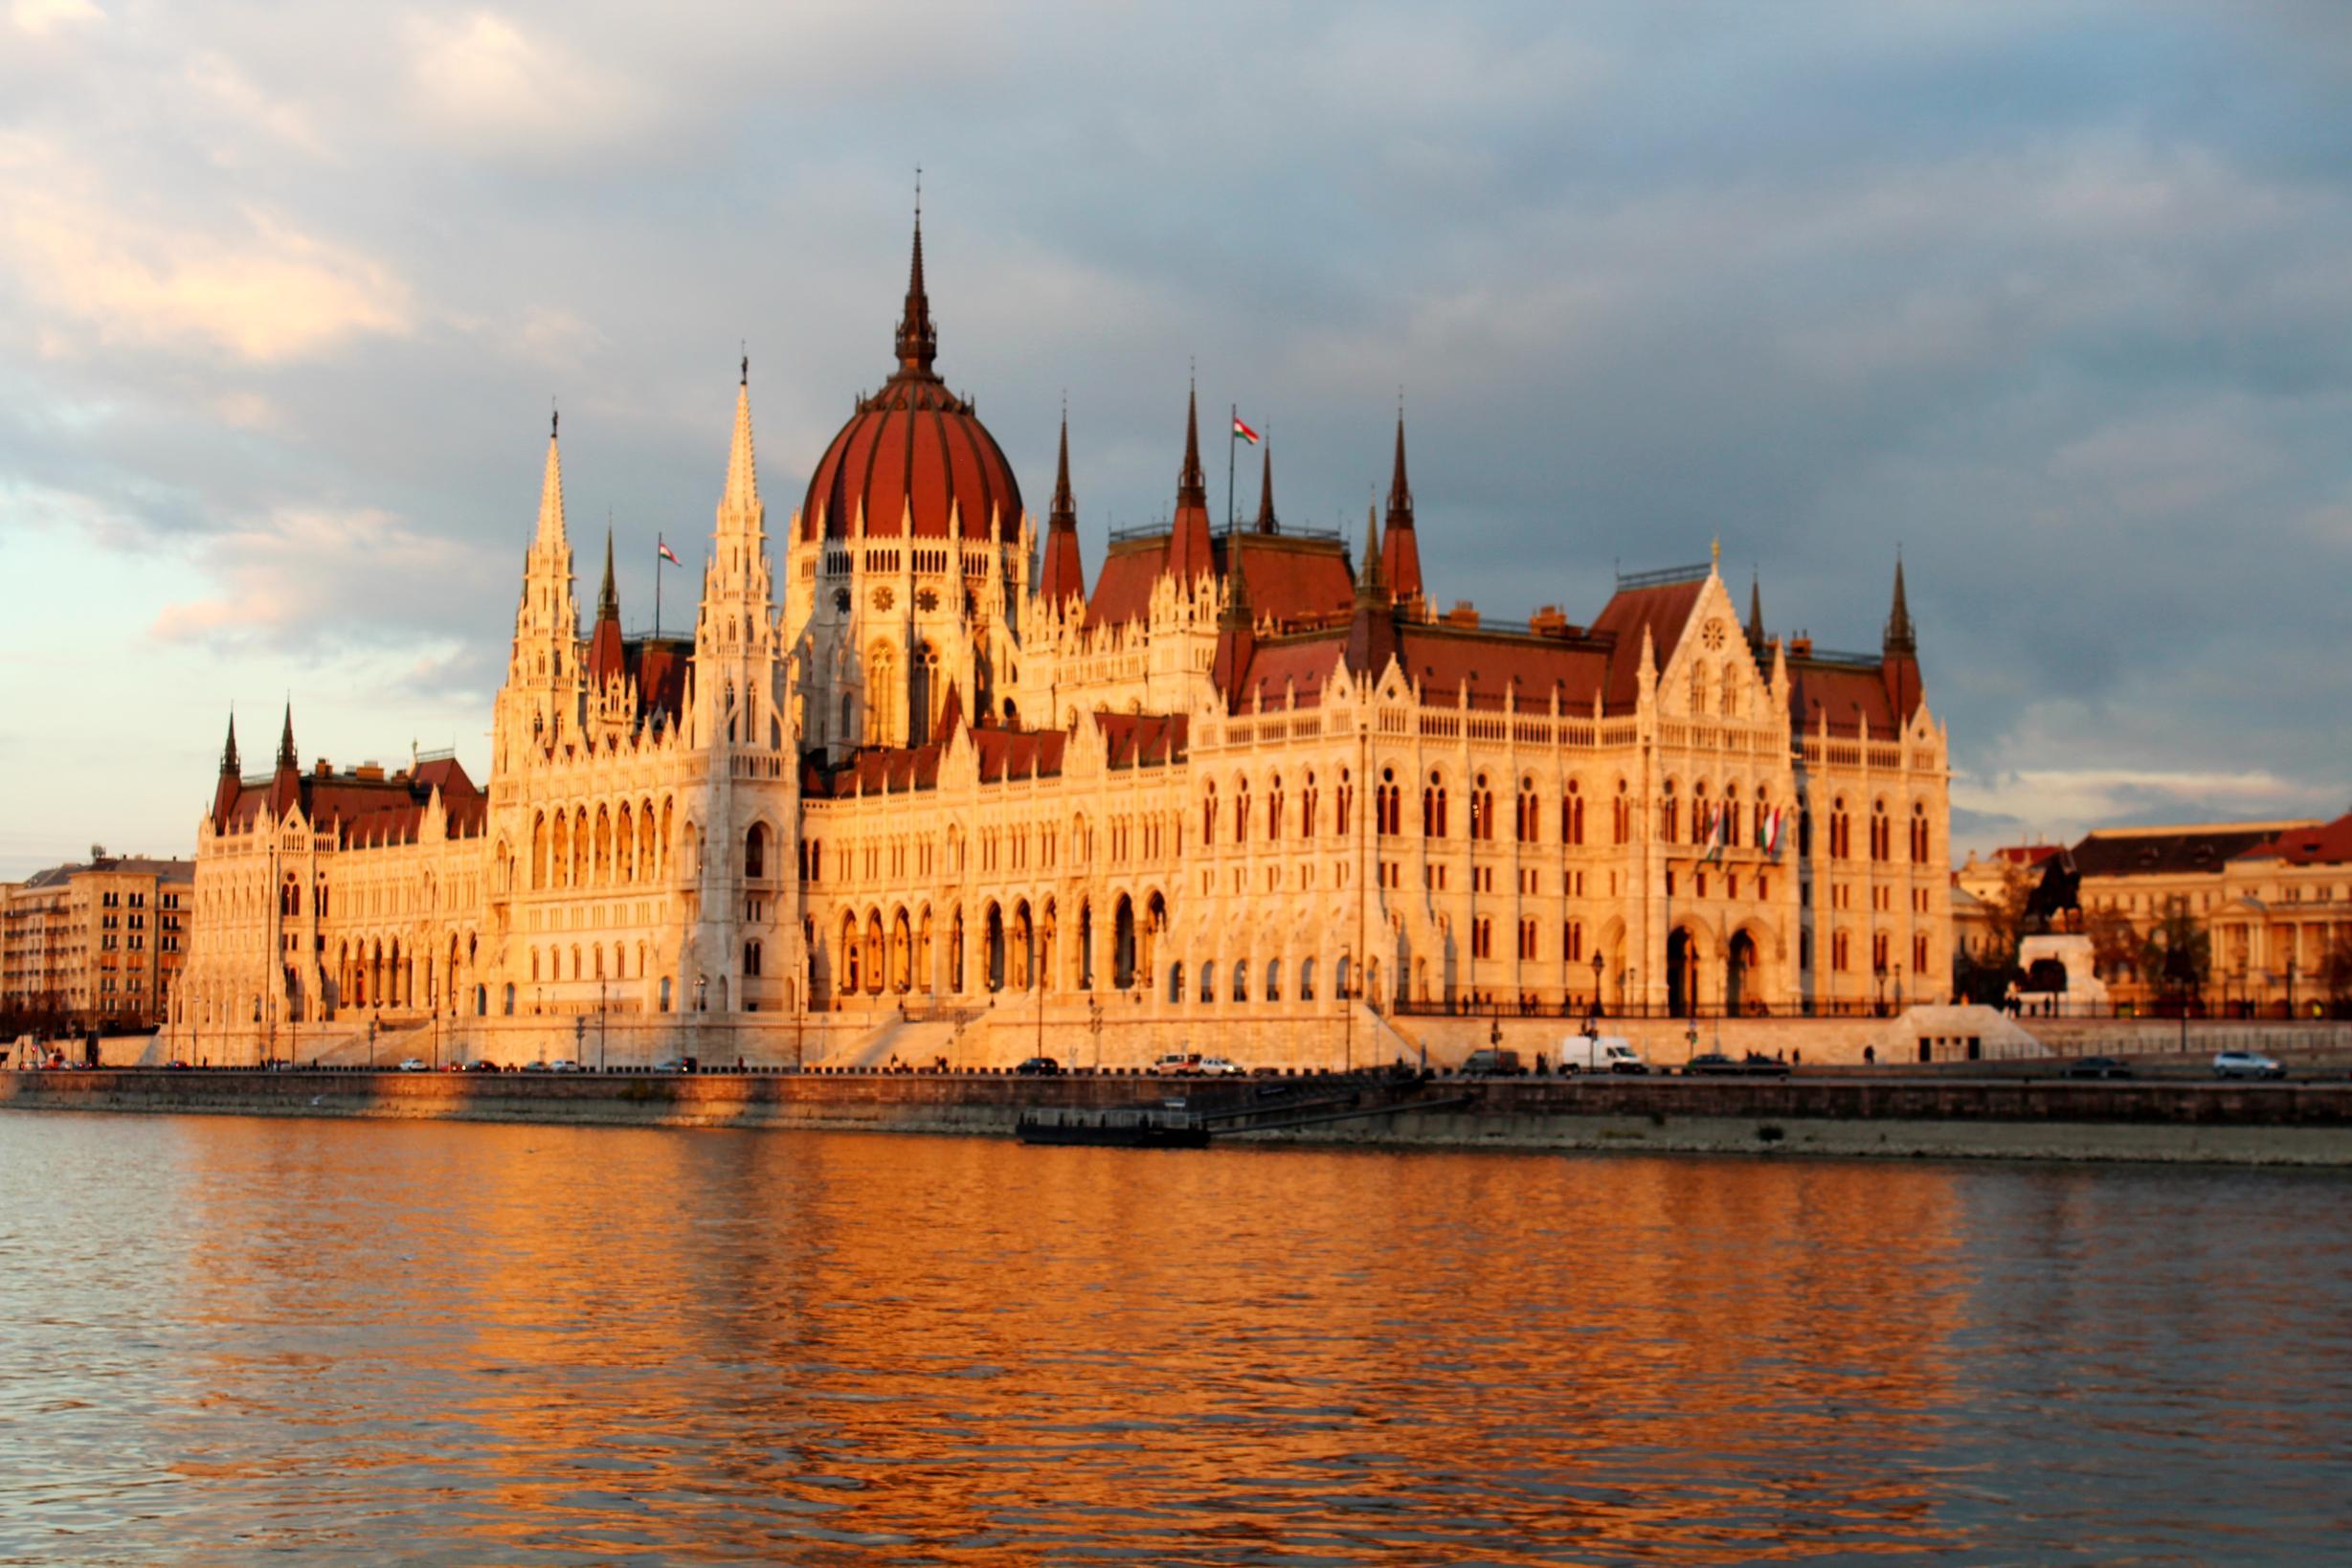 Das Parlamentsgebäude